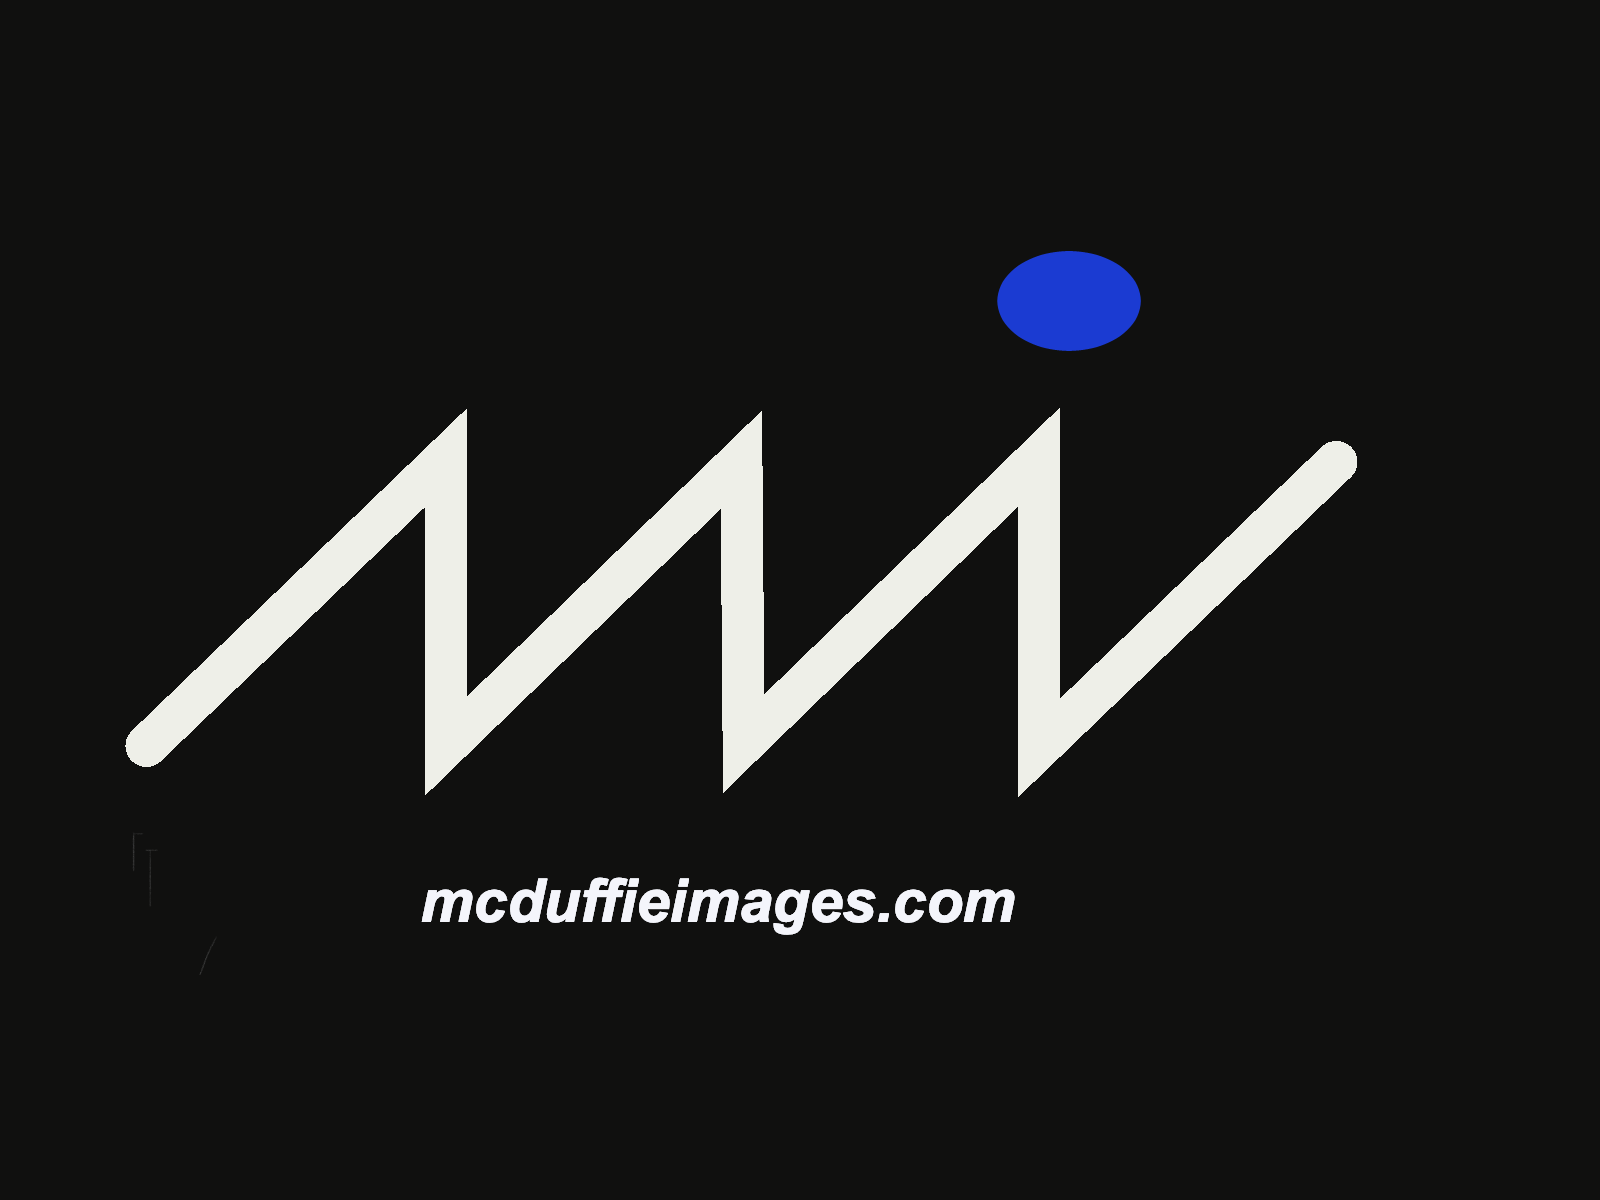 McDuffie Images, LLC